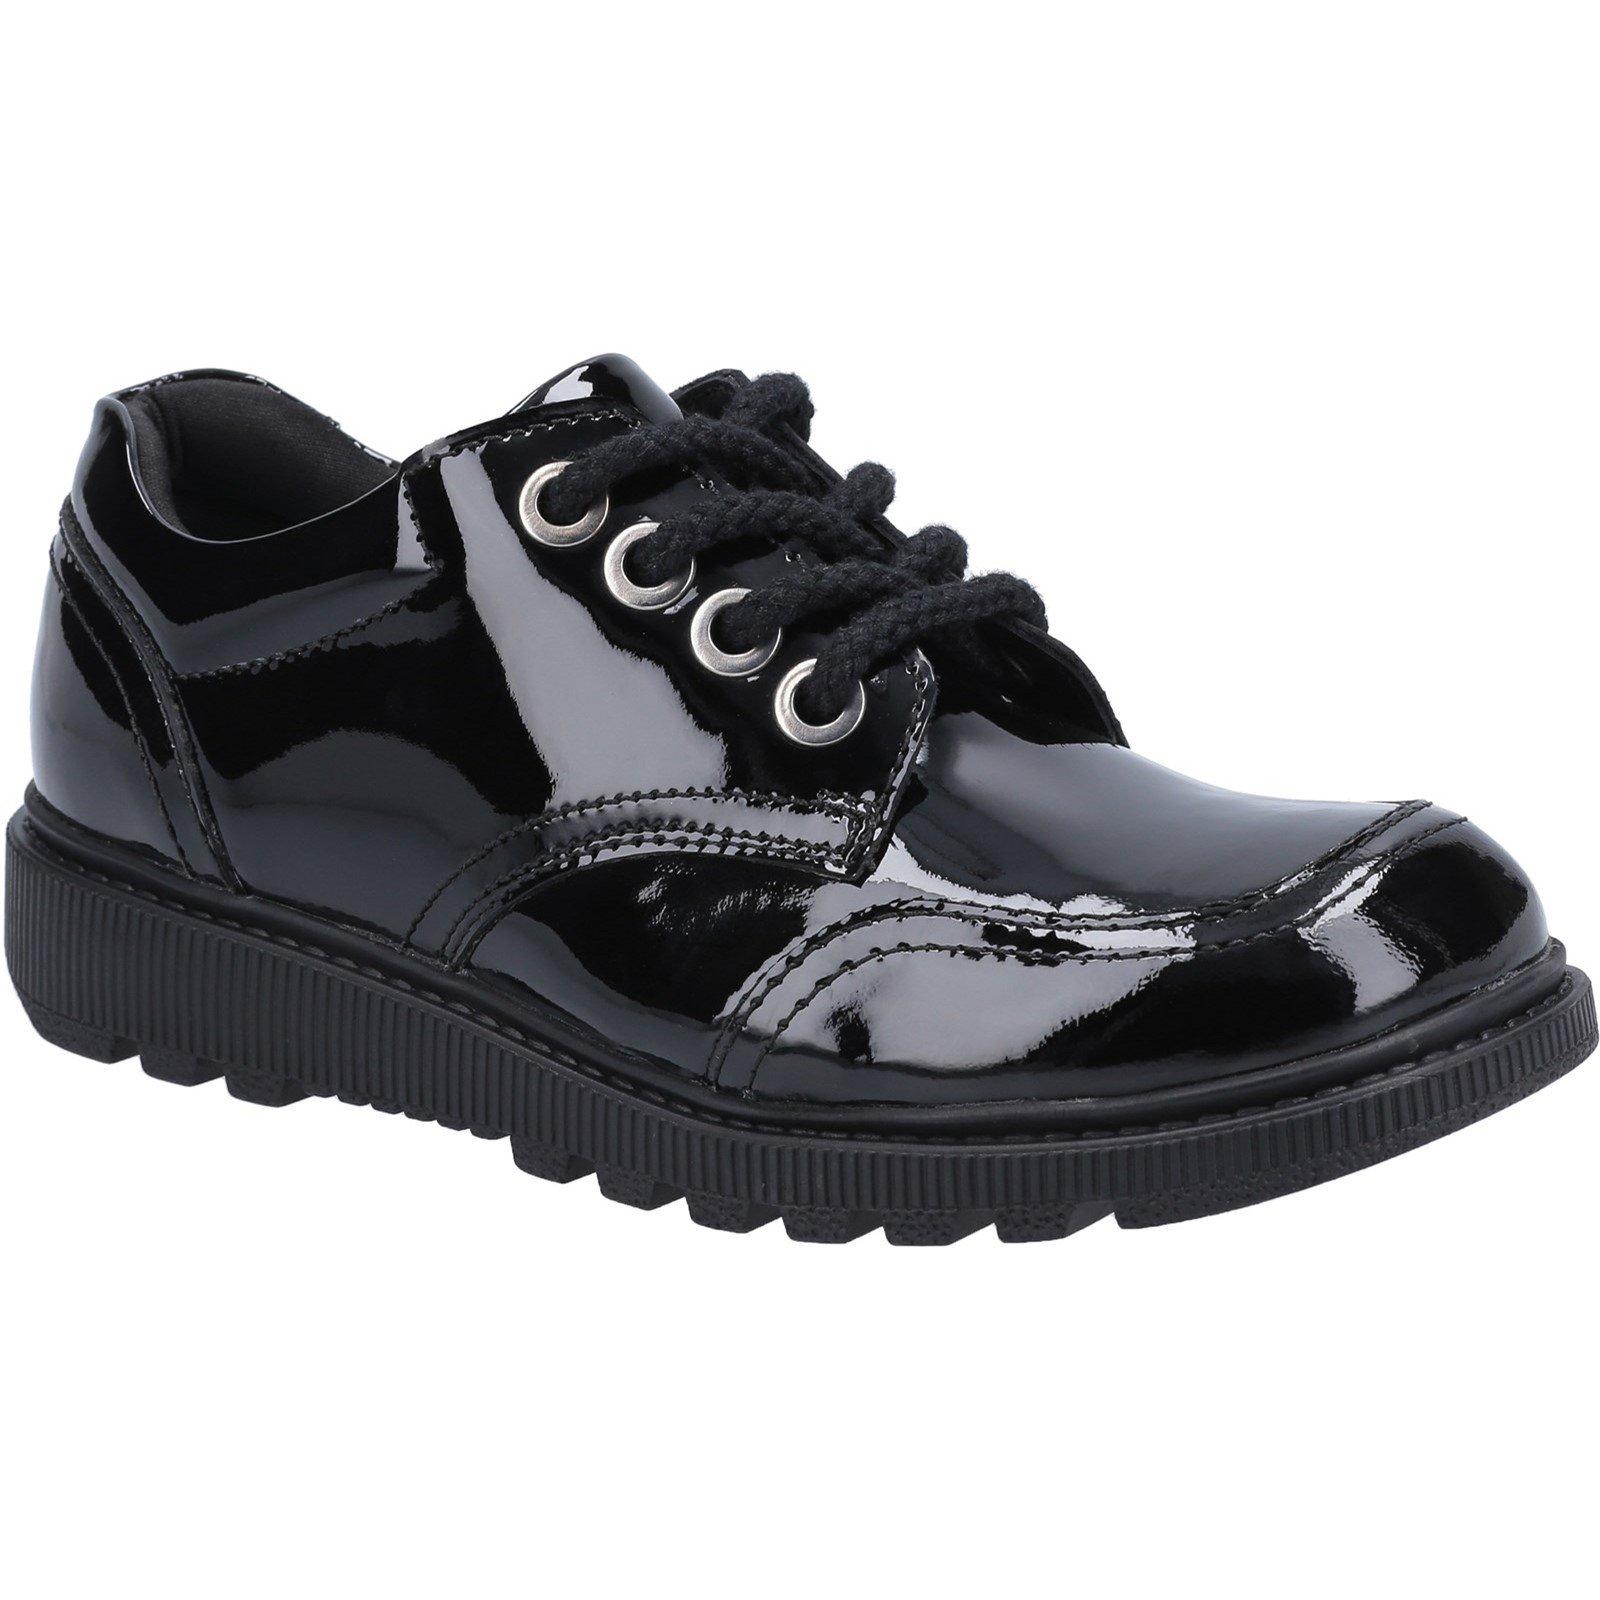 Hush Puppies Kid's Kiera Junior Patent School Shoe Black 30823 - Patent Black 1